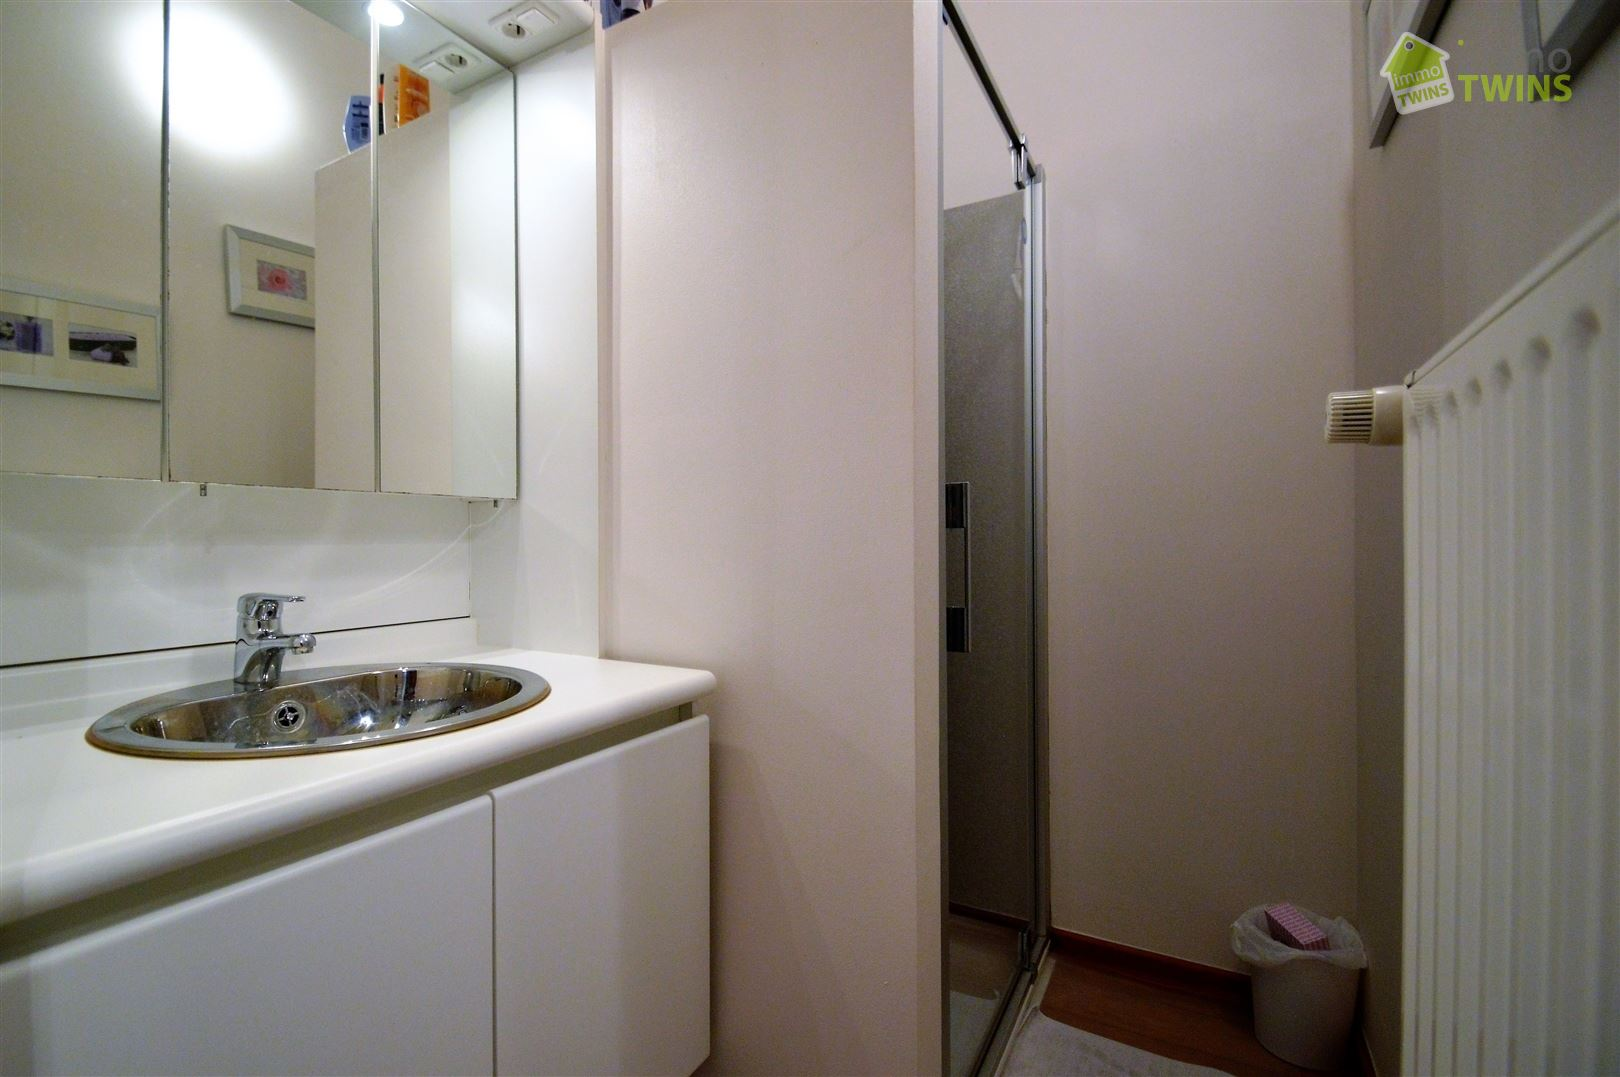 Foto 14 : Duplex/Penthouse te 2890 SINT-AMANDS (België) - Prijs € 429.000